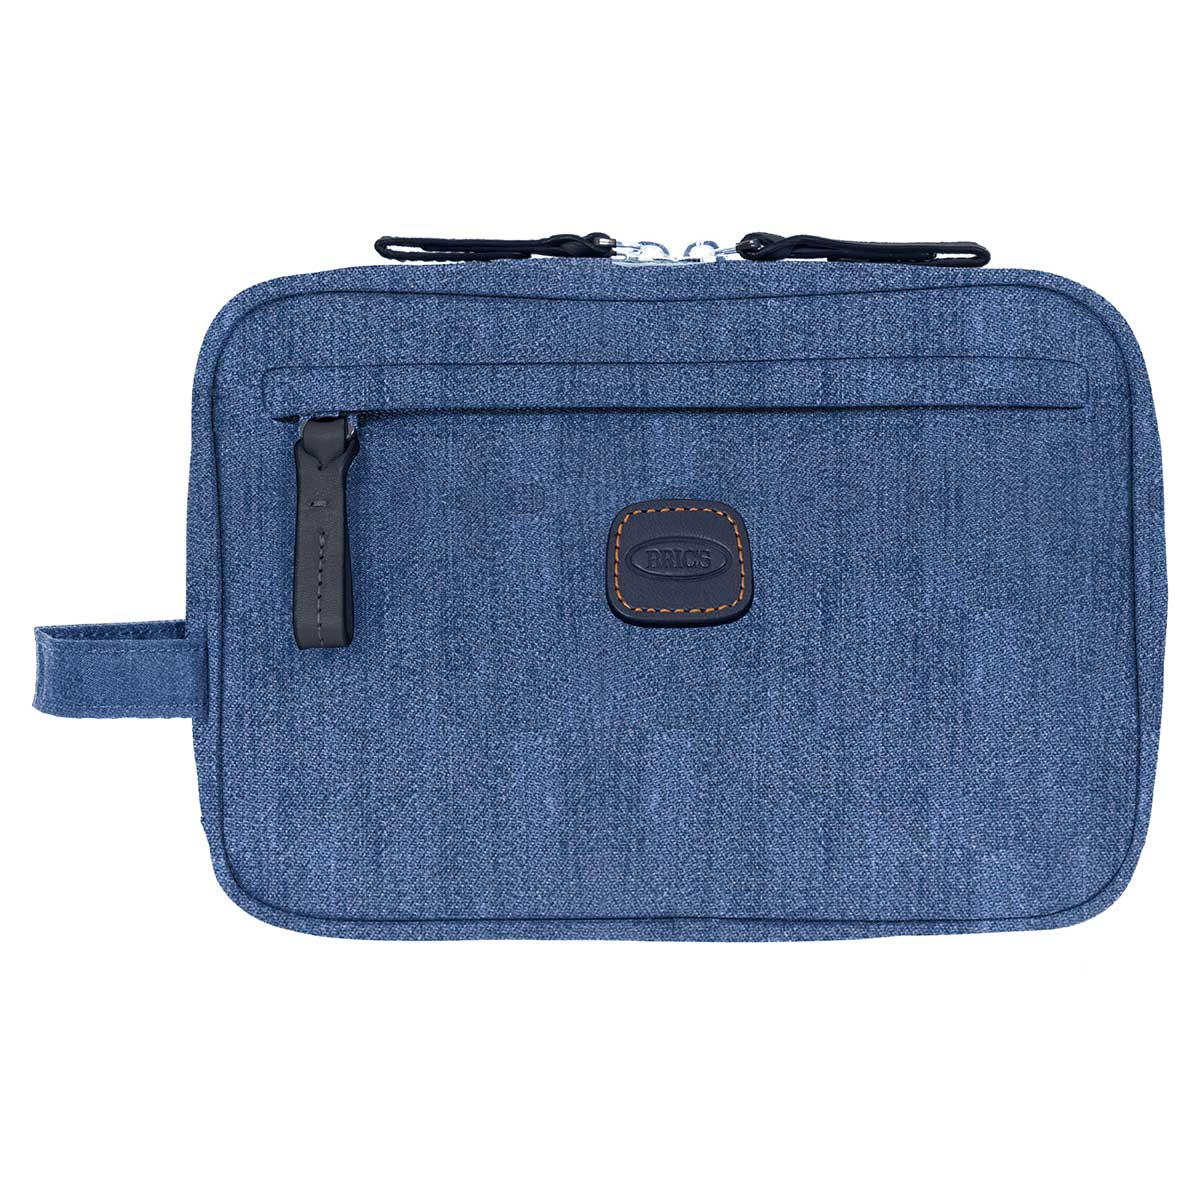 X-Bag Hand Bag - Papyrus   BRIC'S Travel Bag